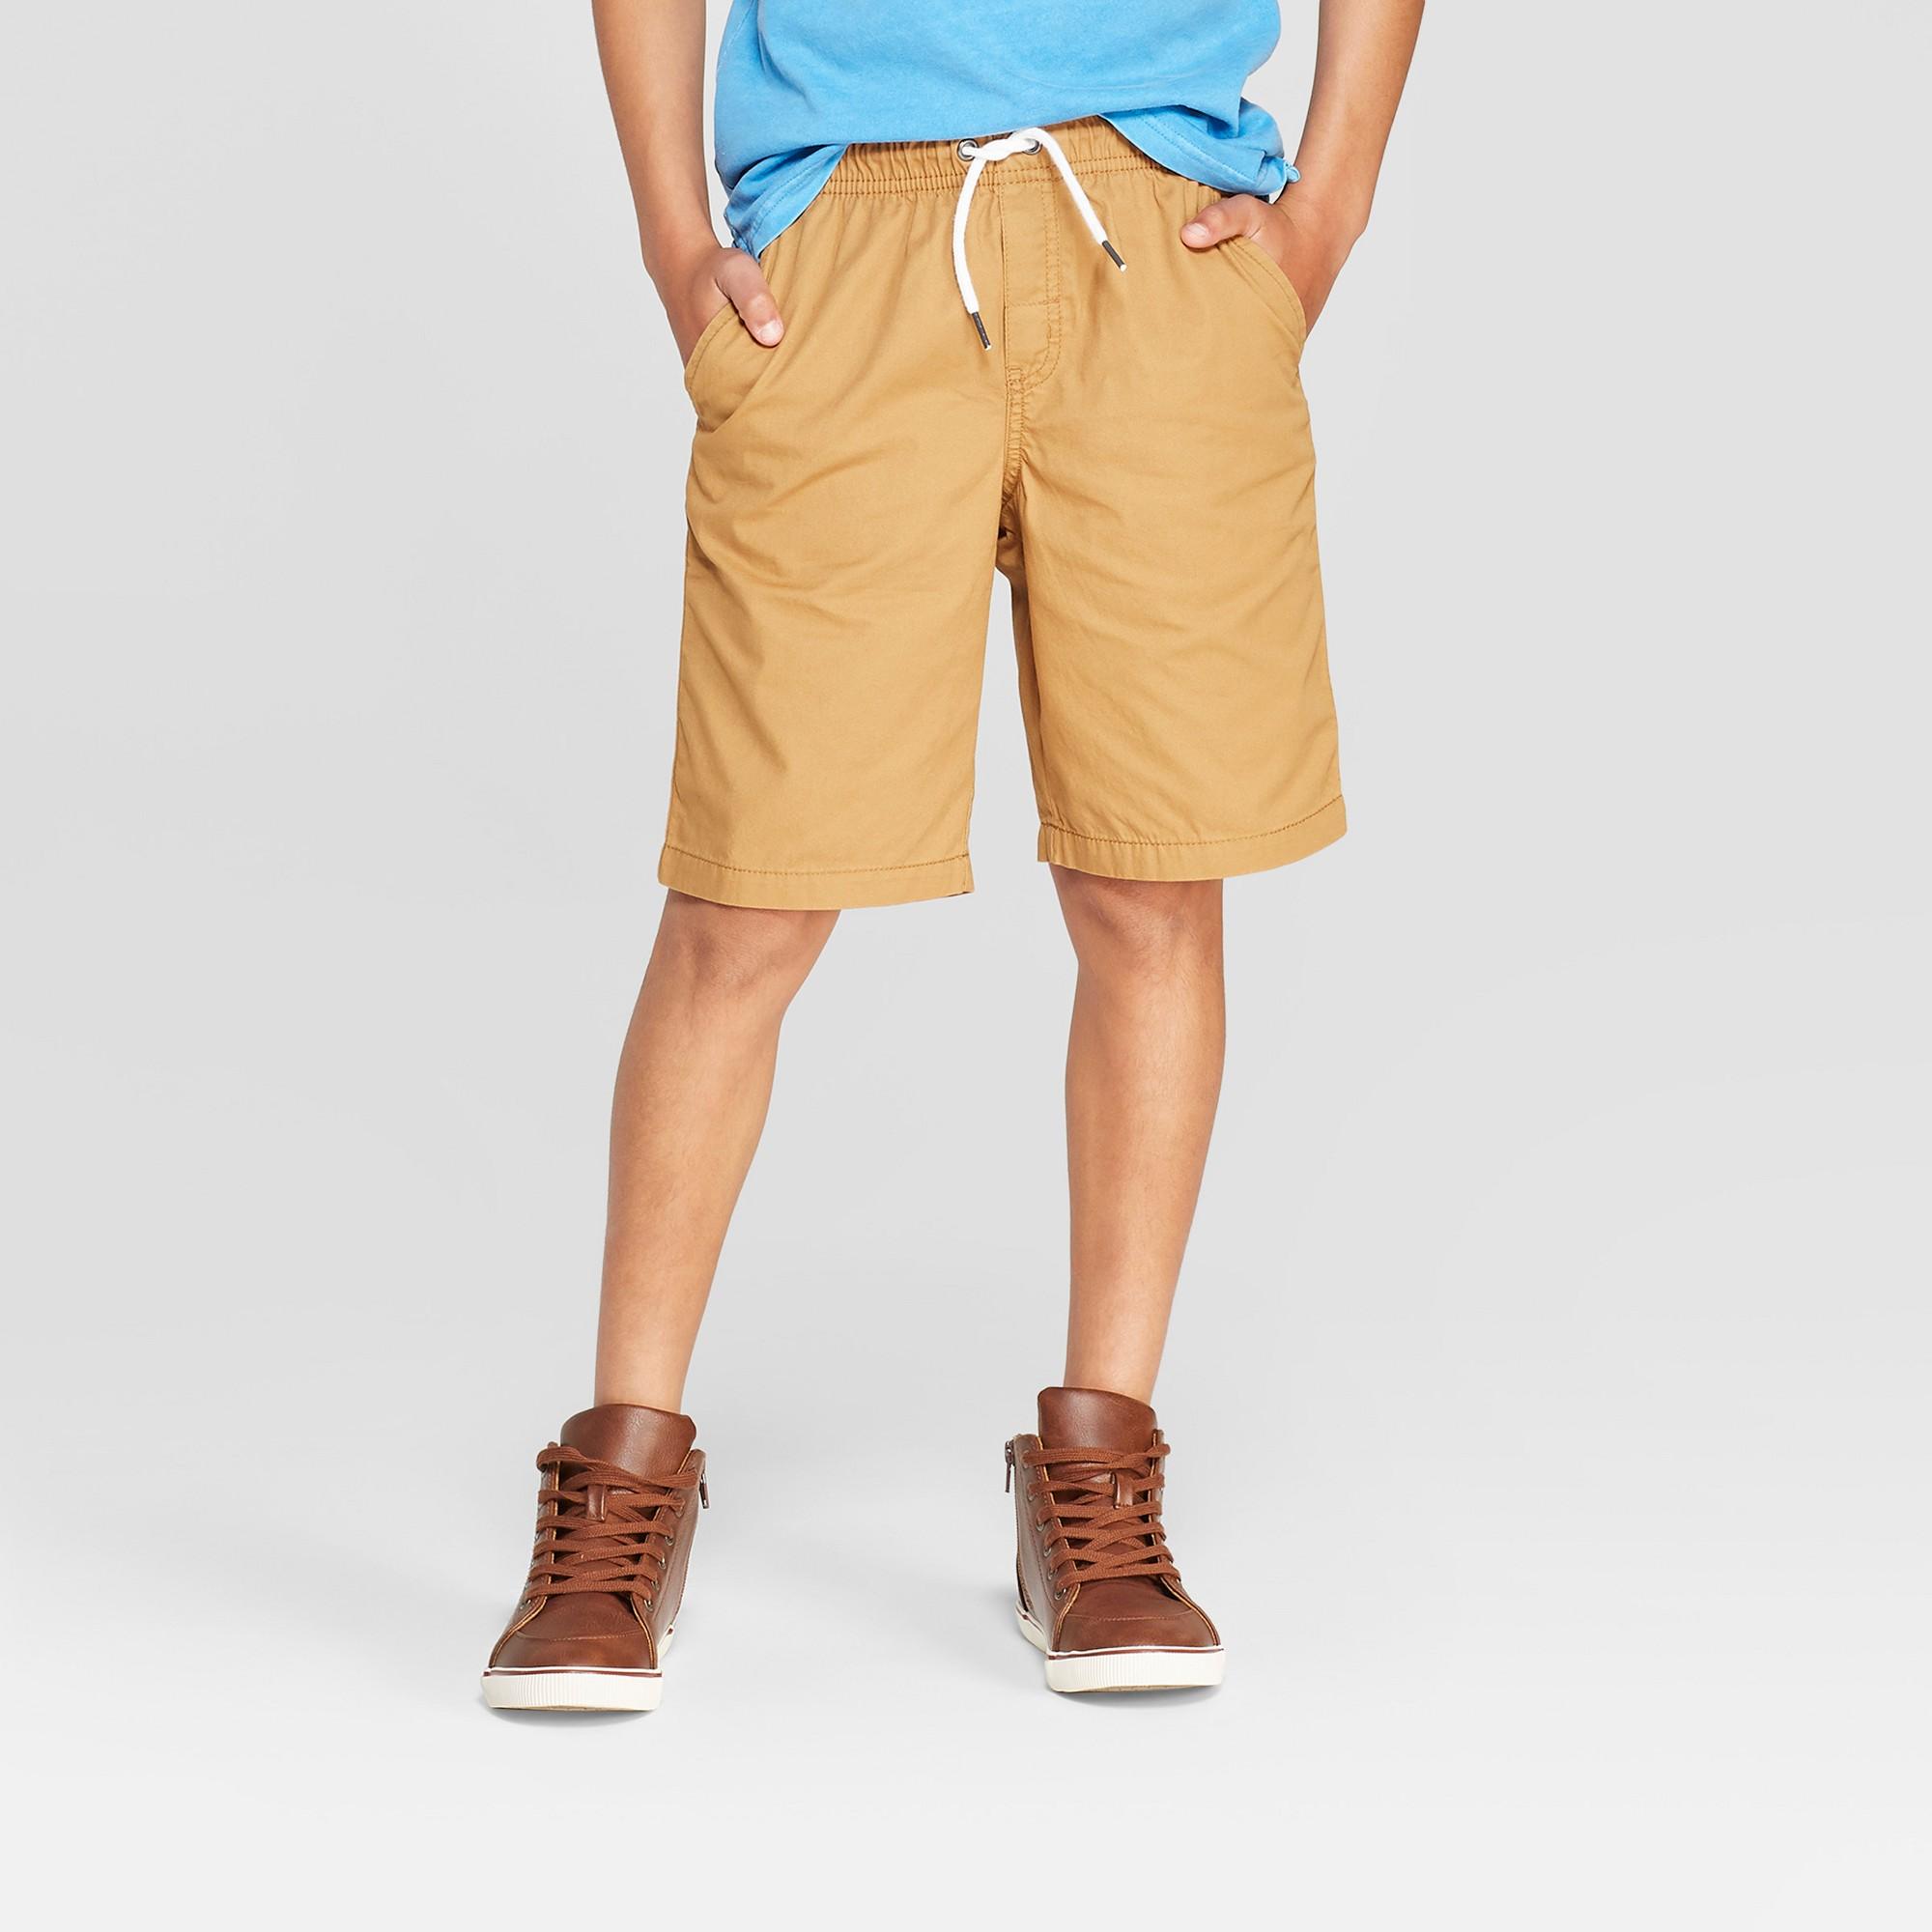 Boys' Pull-On Chino Shorts - Cat & Jack Brown XL, Boy's